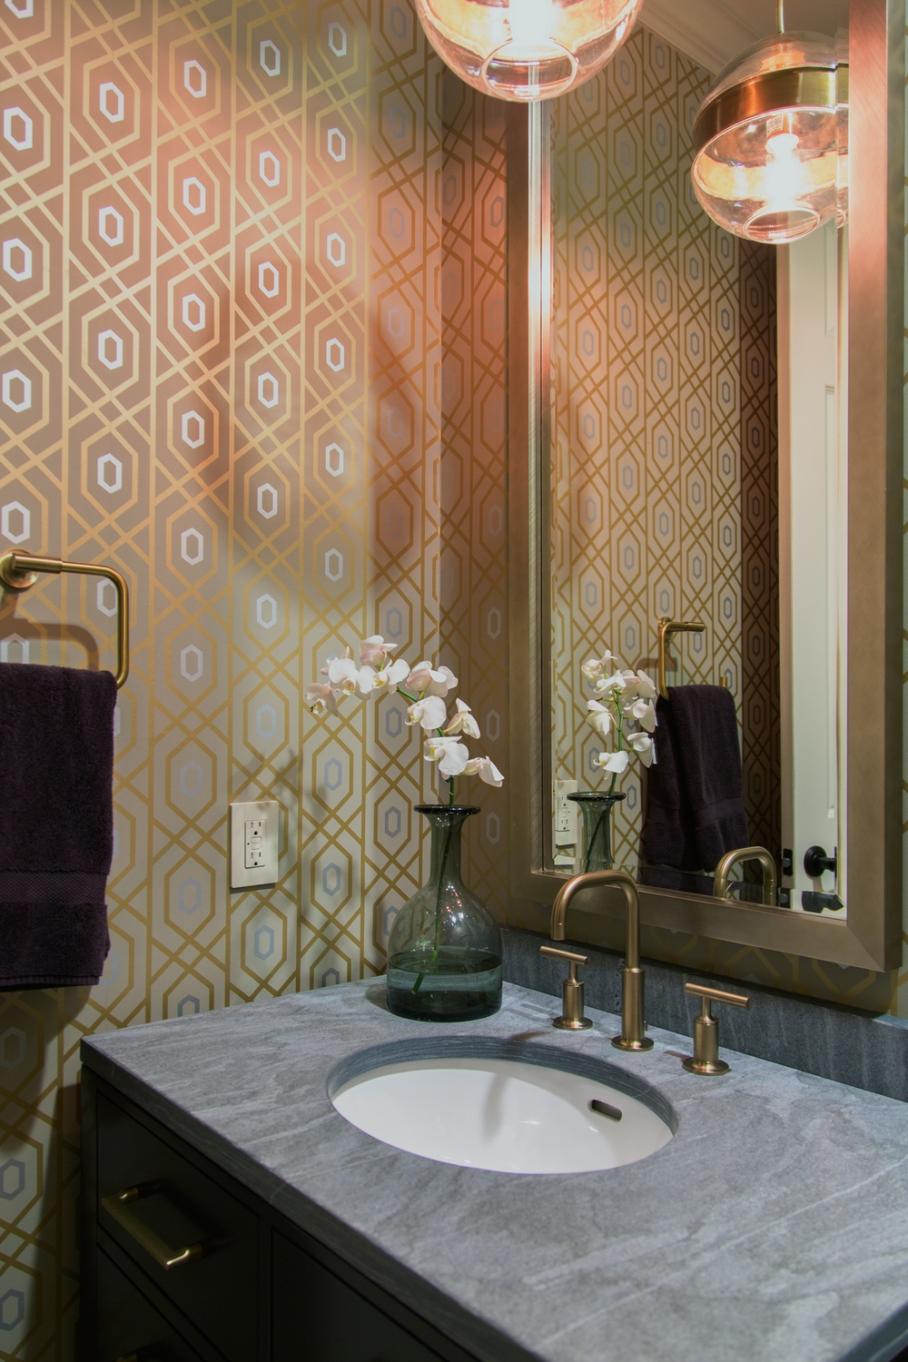 Powder room remodel; limestone countertop; gilded mirror; bathroom fixtures; glass pendant lighting | Interior Designer: Carla Aston / Photographer: Tori Aston